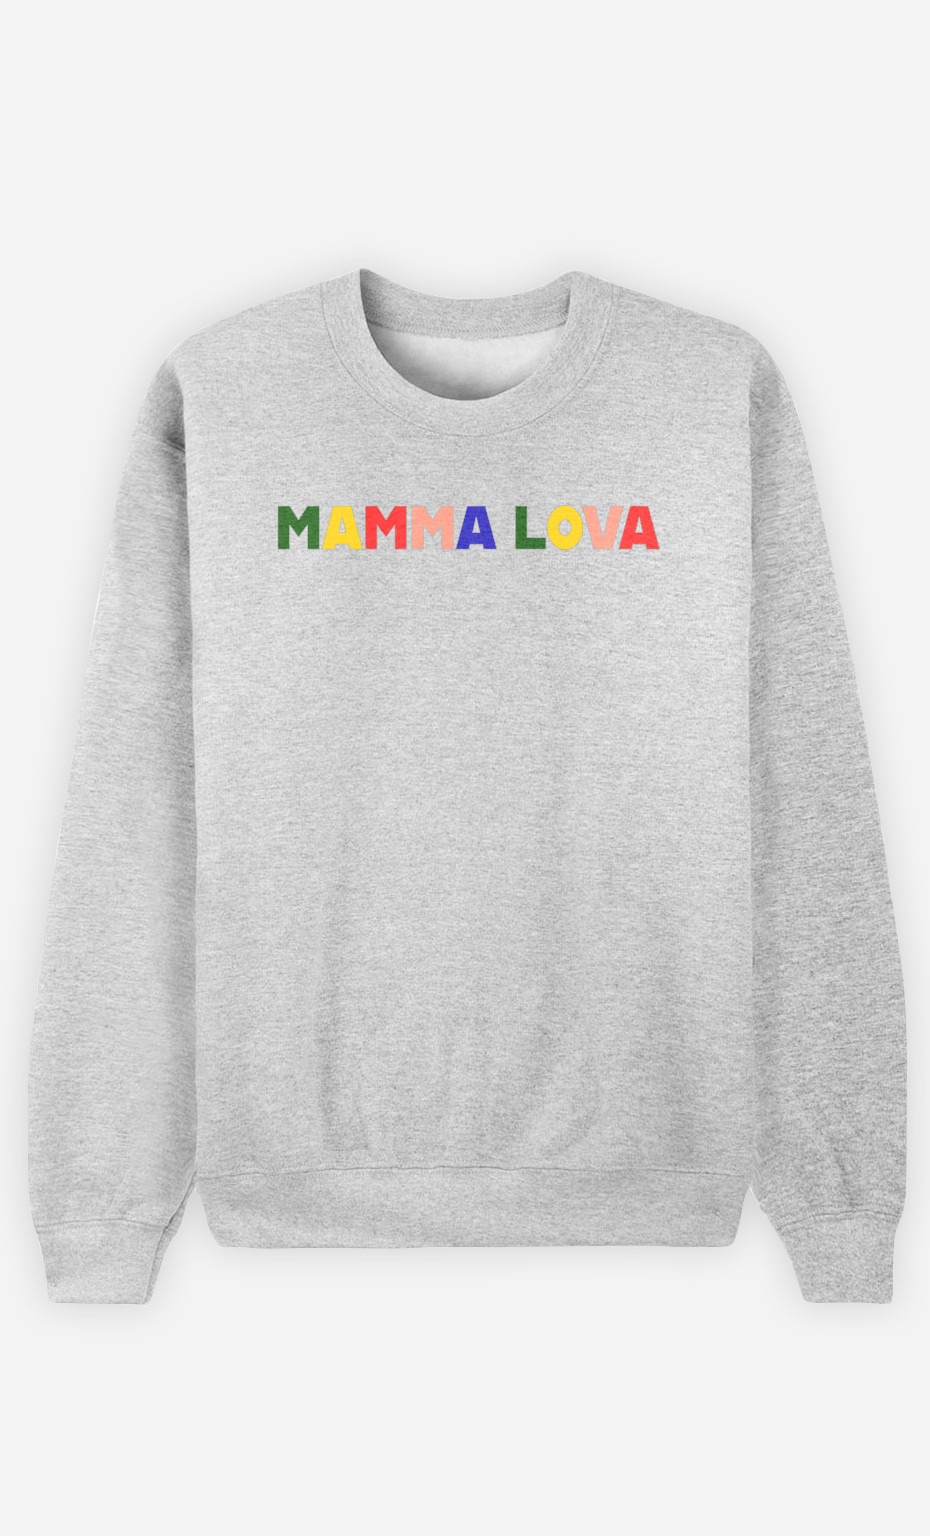 Sweatshirt Mamma Lova